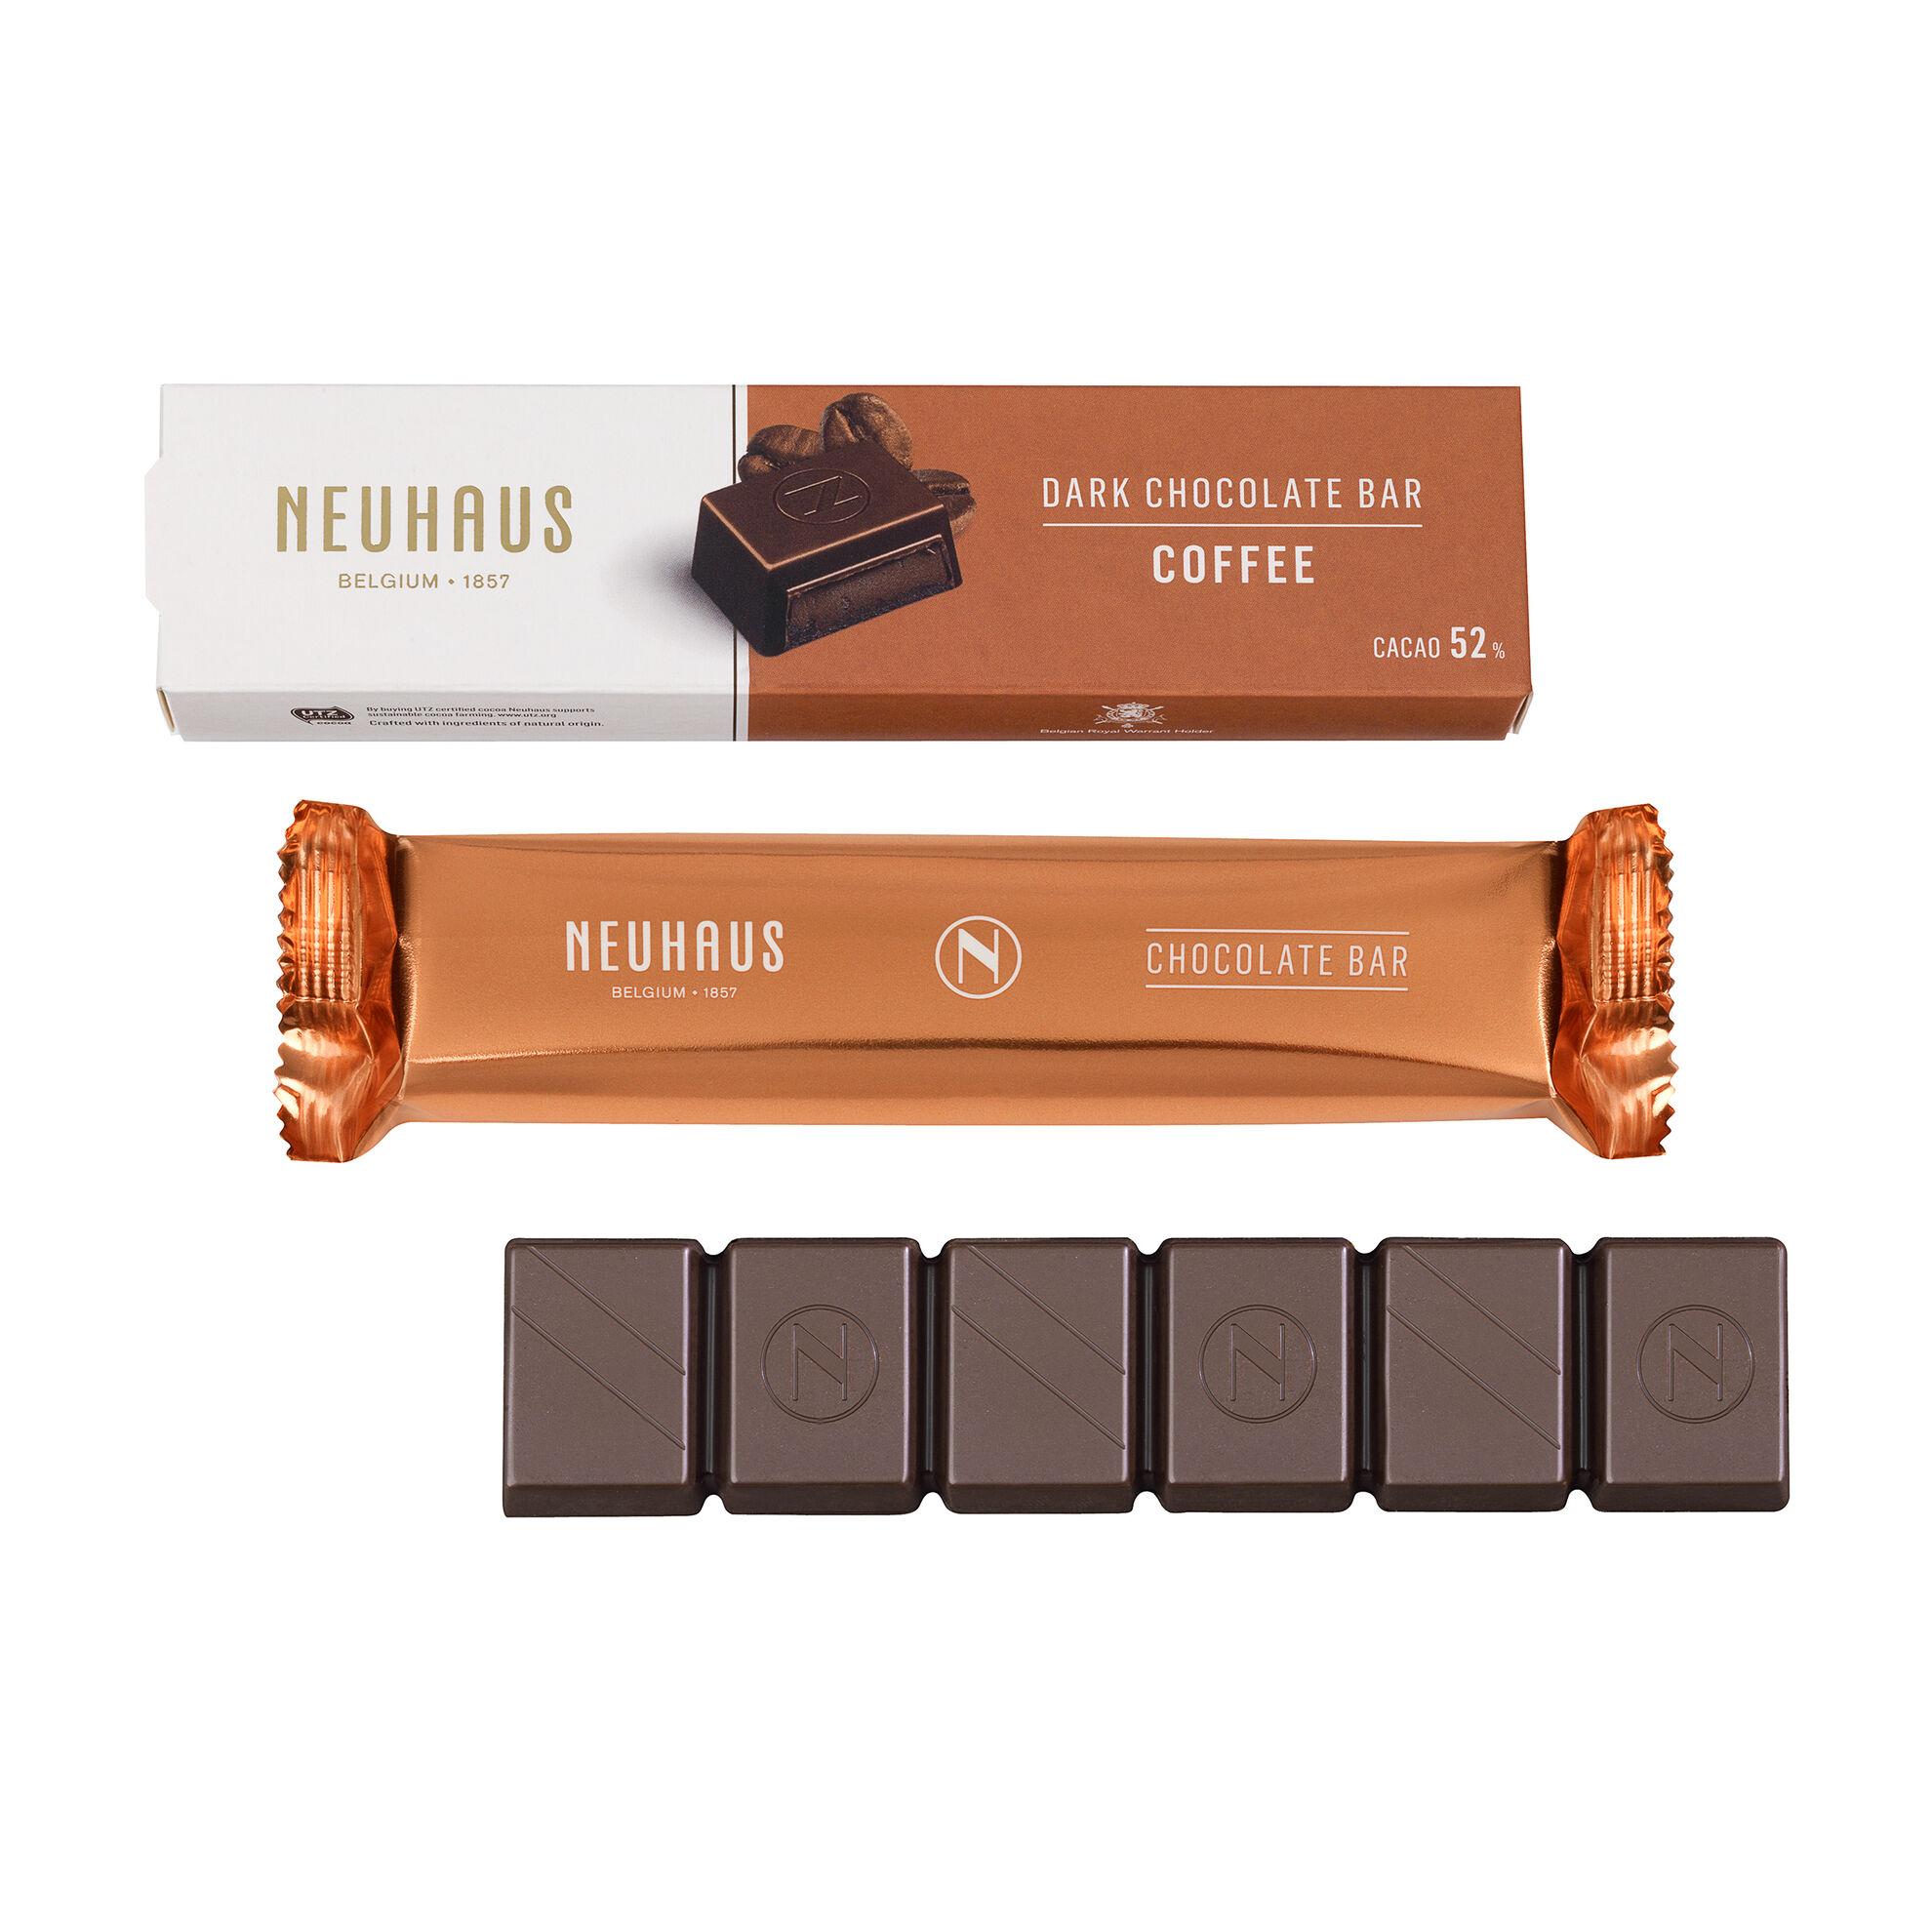 Dark Chocolate Bar - Coffee image number 01